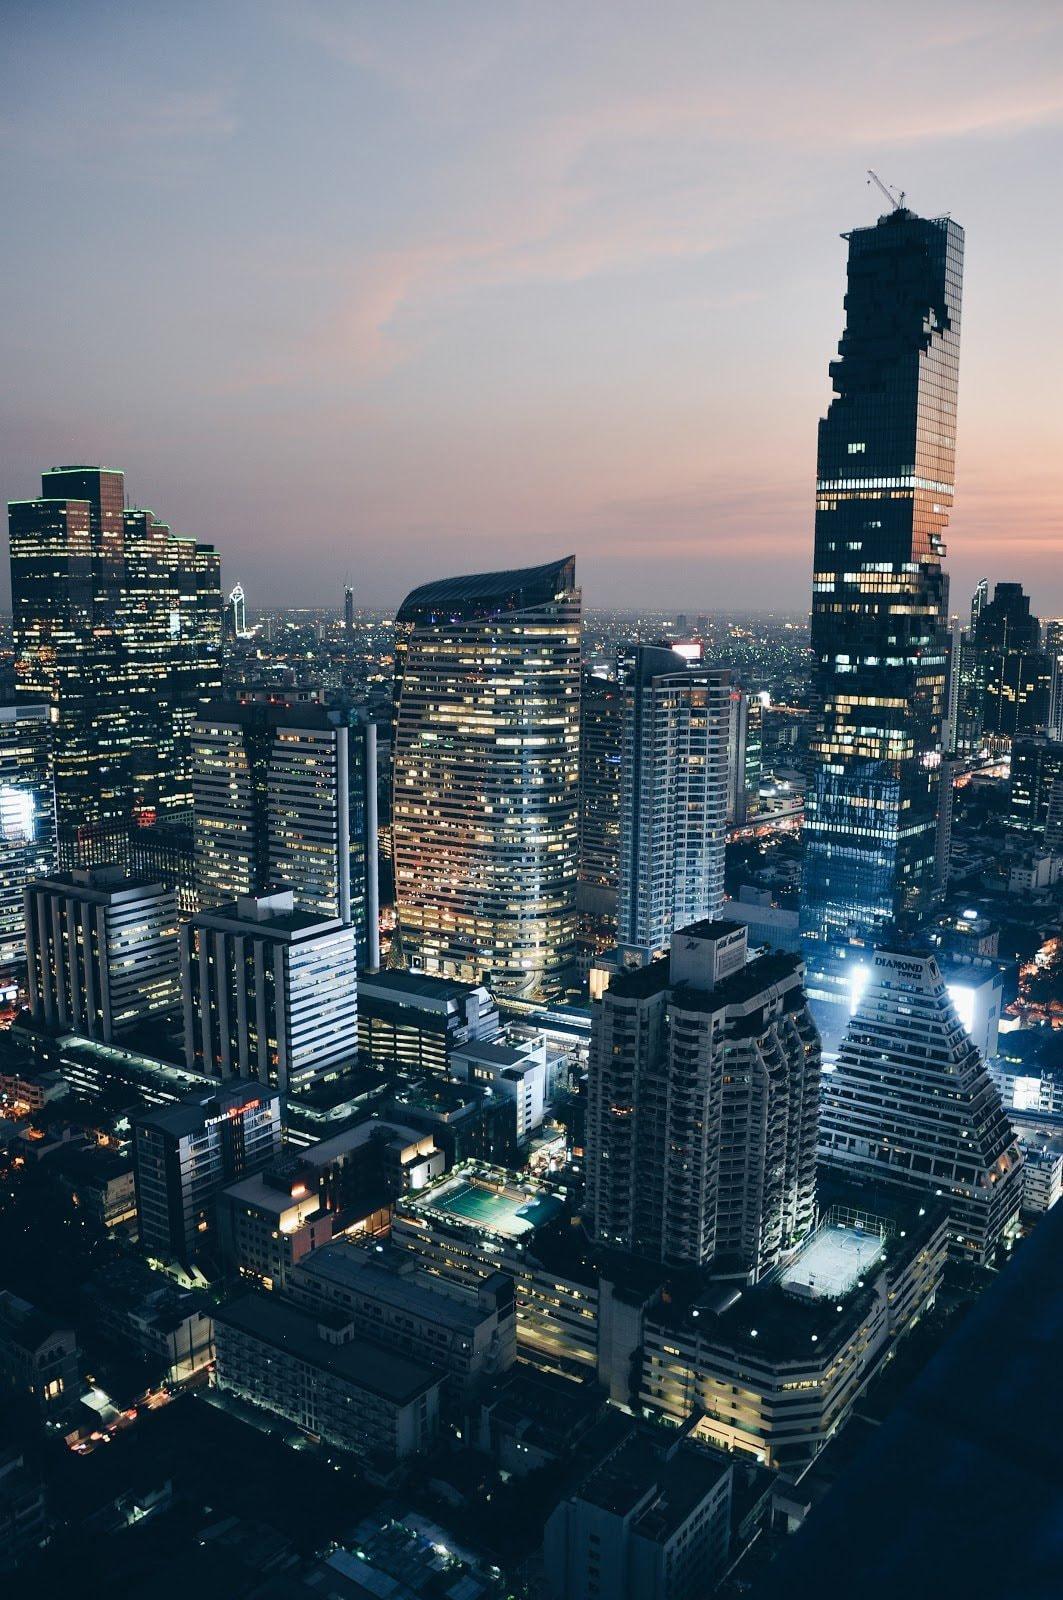 cityscape-photography-alex-block